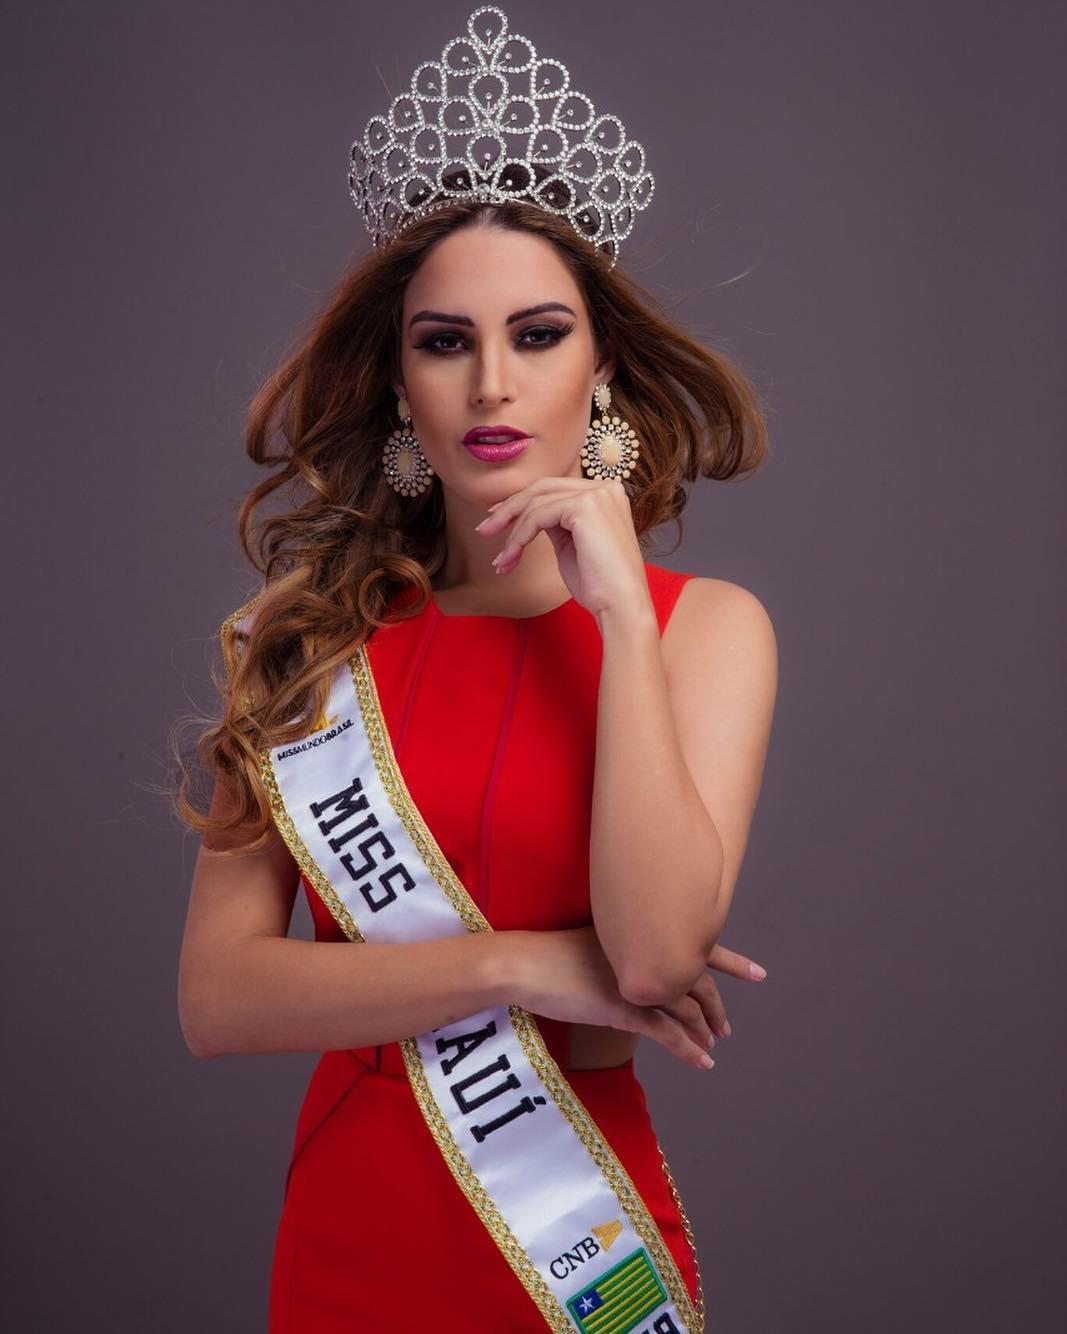 jessica carvalho, miss brasil mundo 2018. 30899911